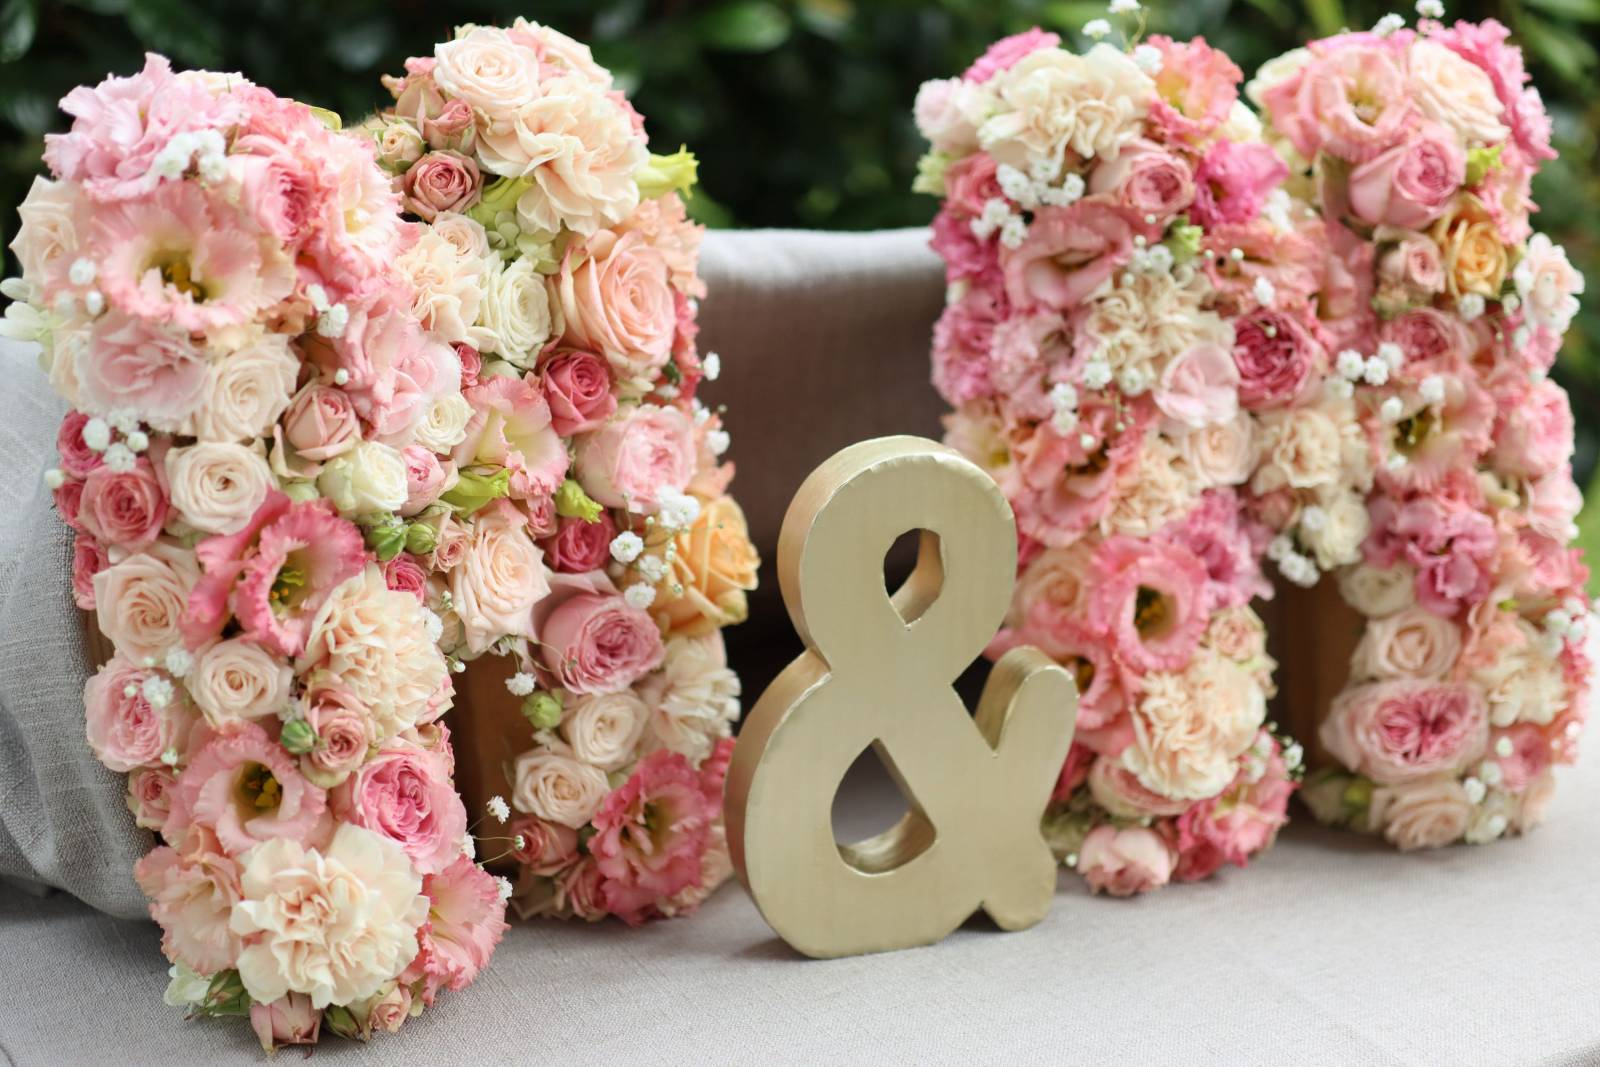 Maison Fleurie - Fotograaf zelfgetrokken - House of Weddings - 14